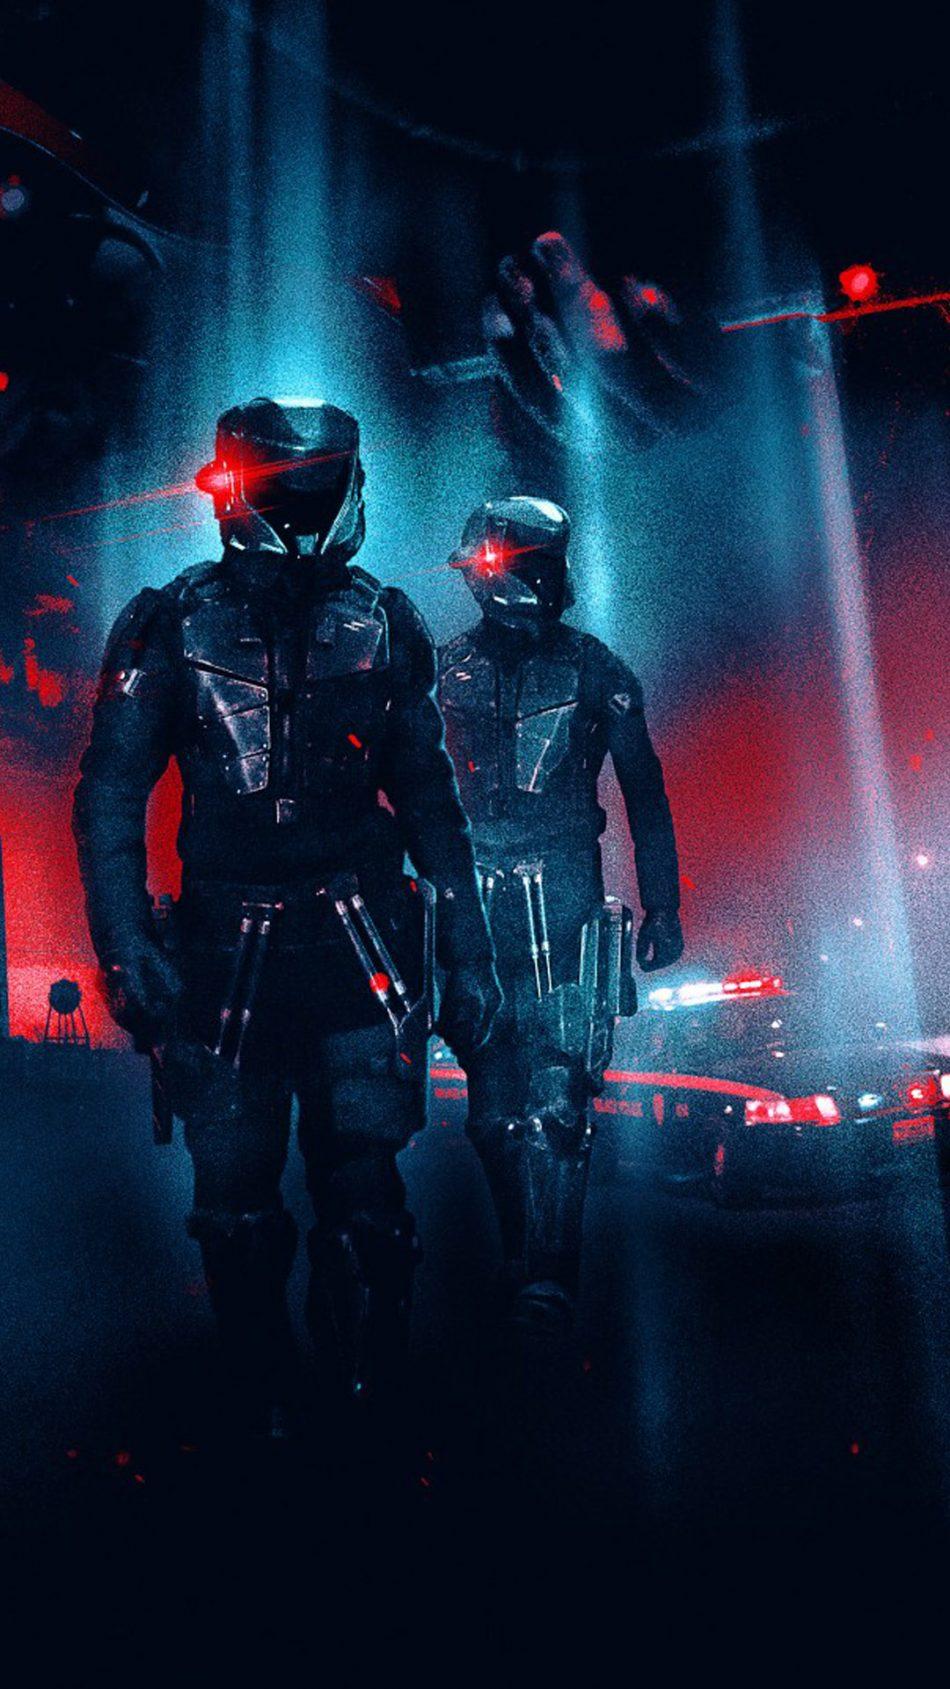 Kin Action Sci-fi 2018 HD Mobile Wallpaper